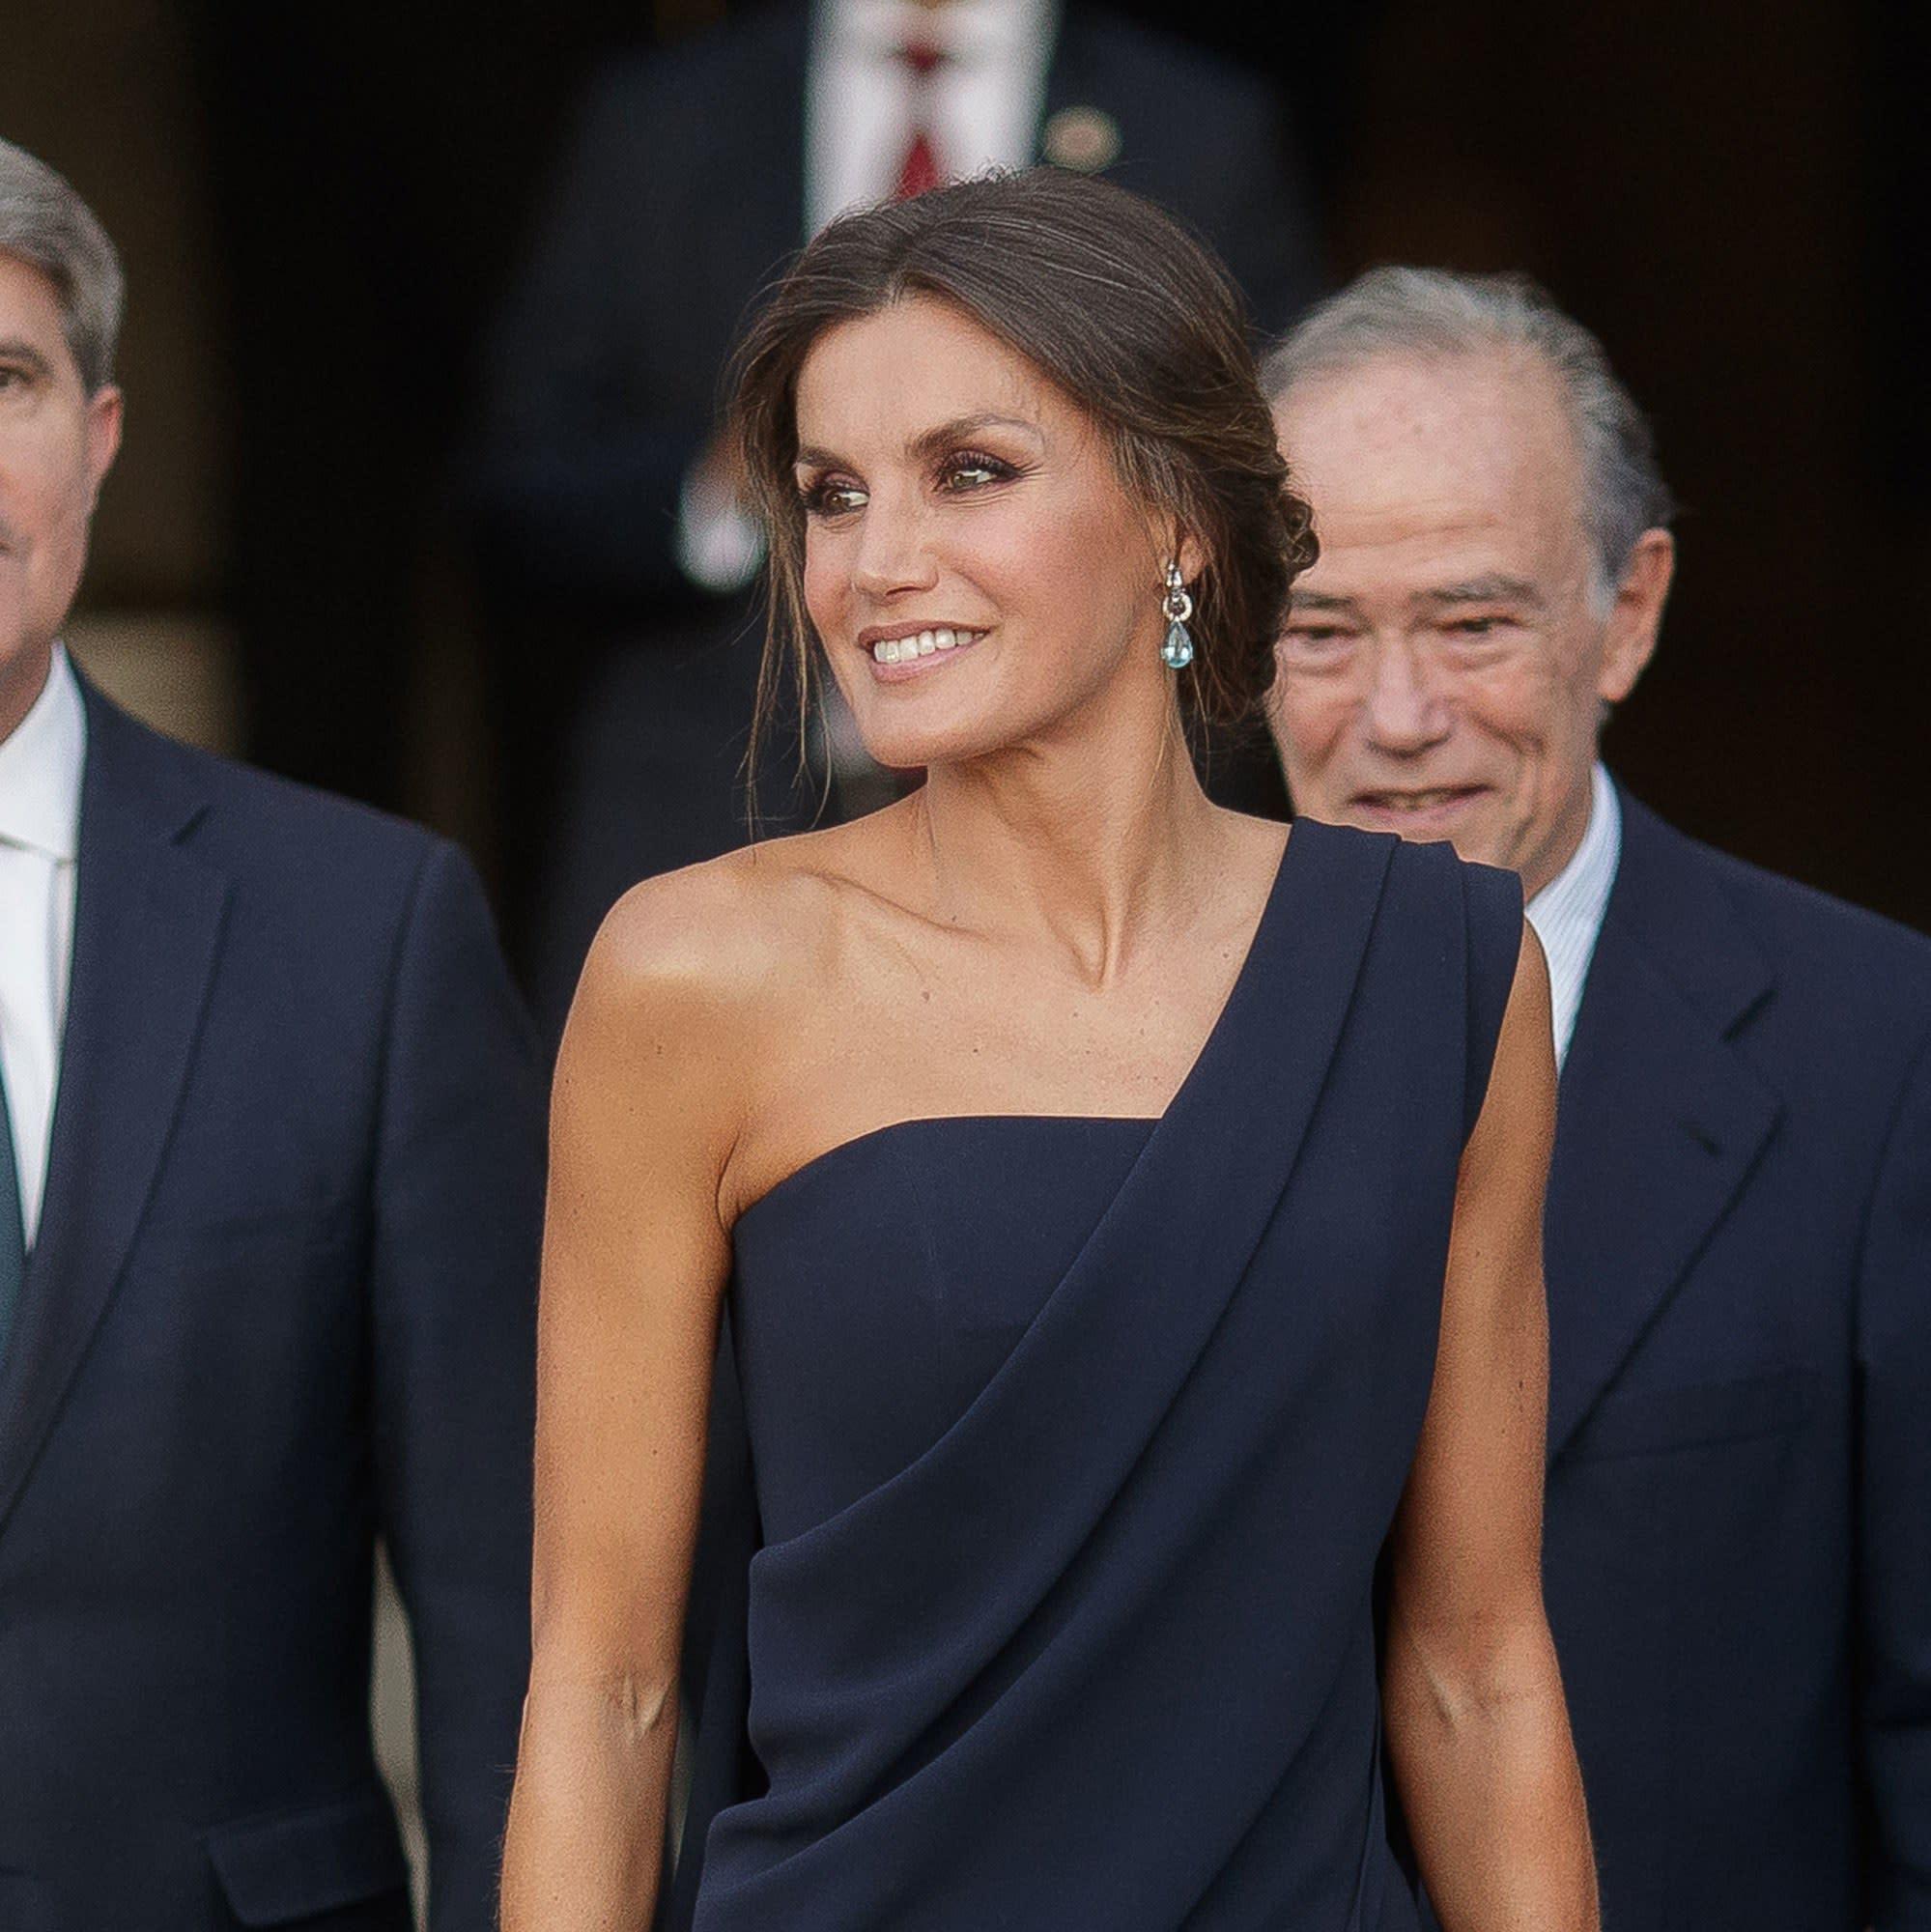 aa14f35ed45c8 Queen Letizia of Spain Reigns in the Black Tie Jumpsuit